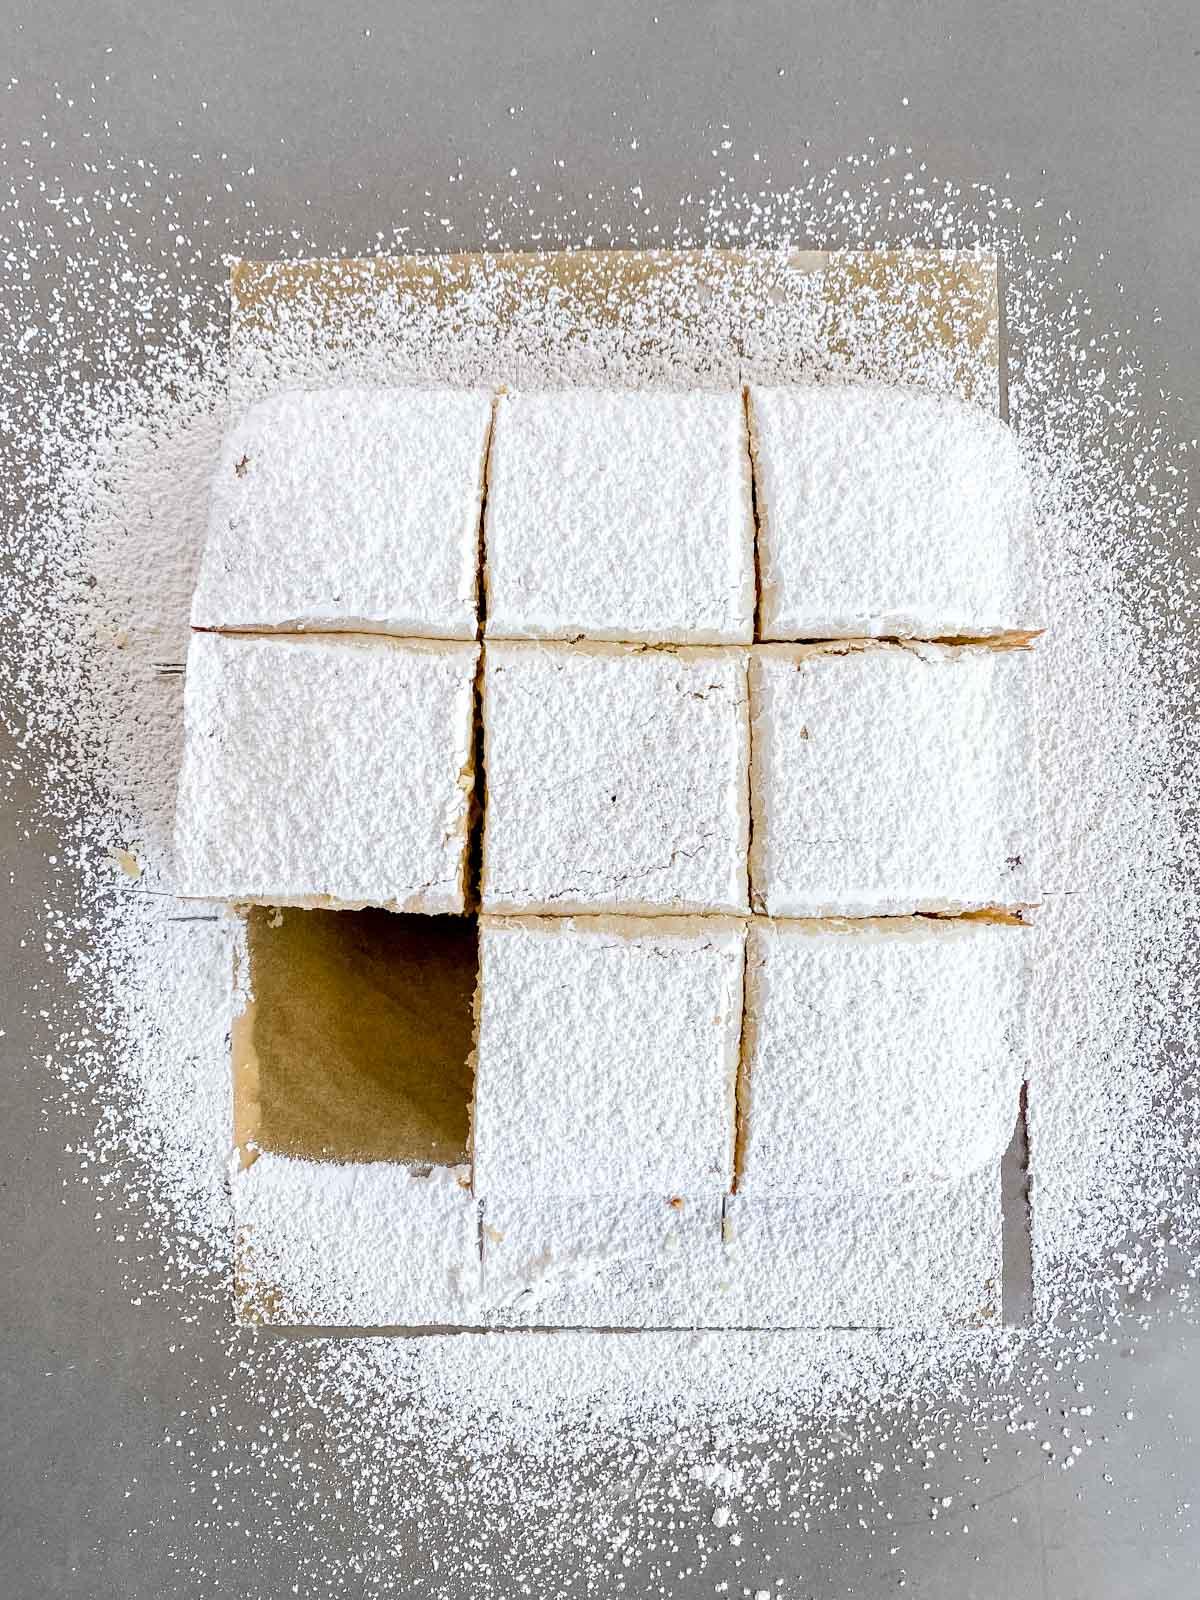 slicing a powdered sugar doughnut cake